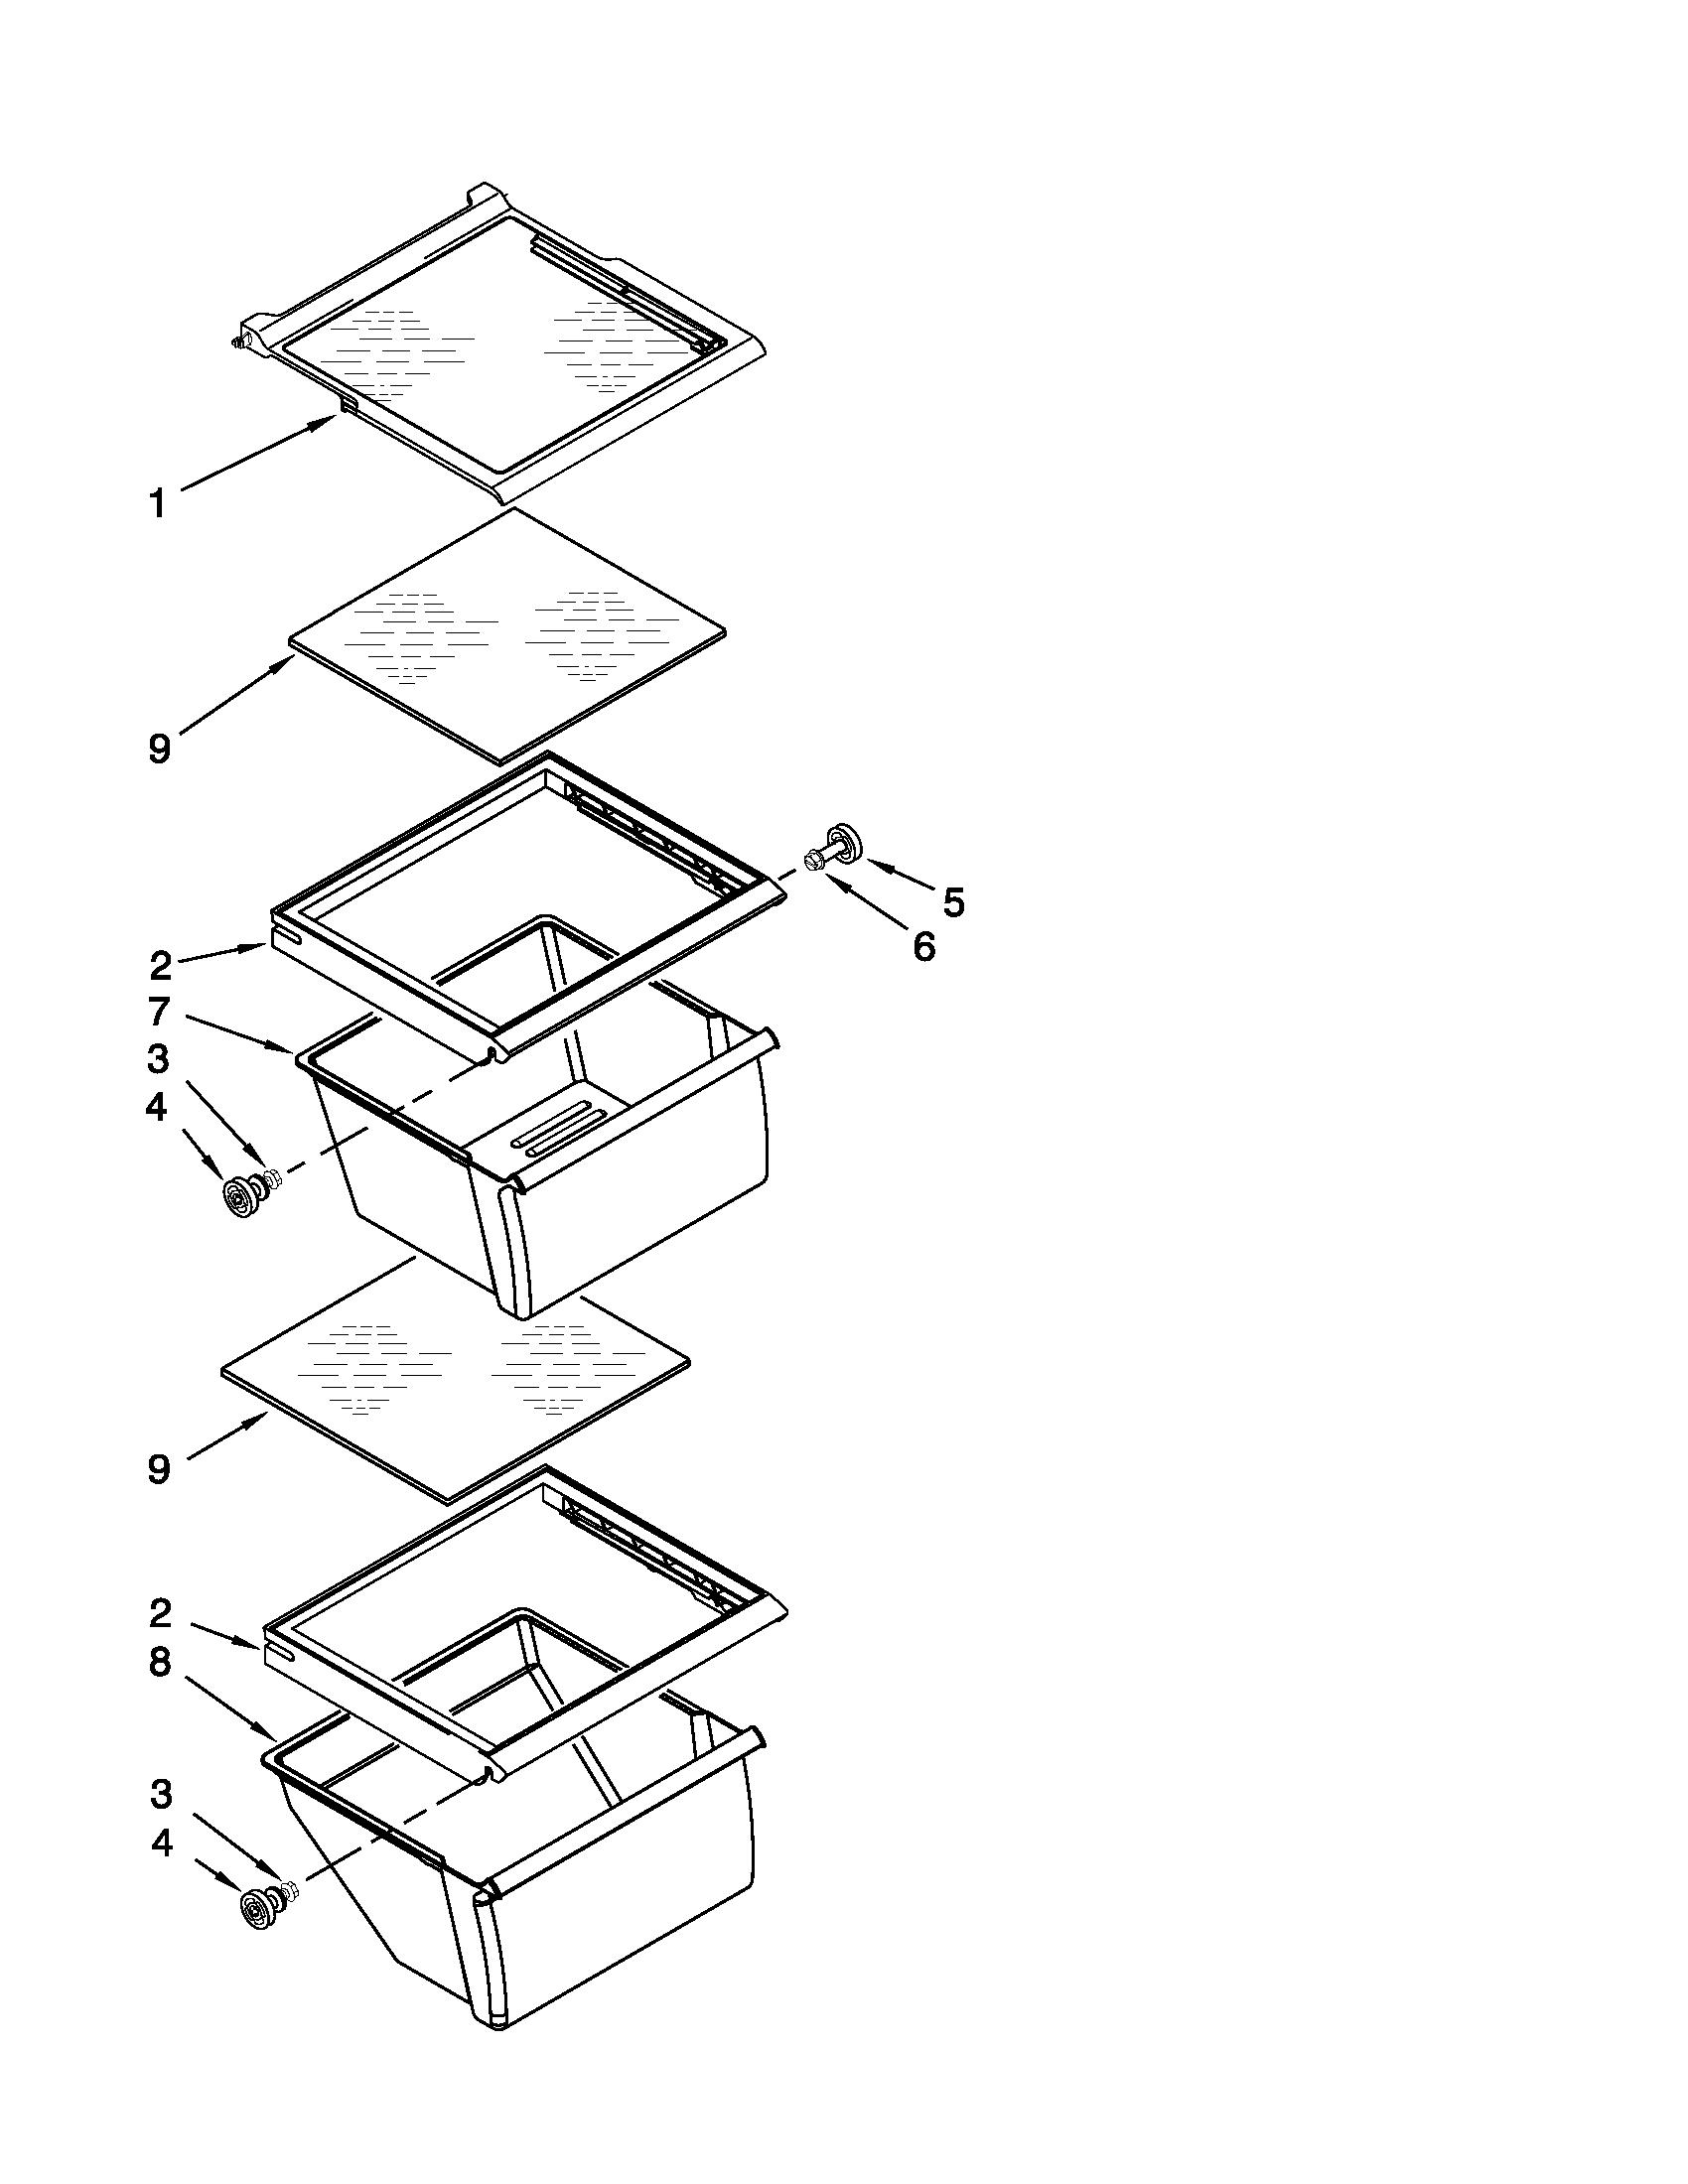 Whirlpool model ED5KVEXVB07 side-by-side refrigerator